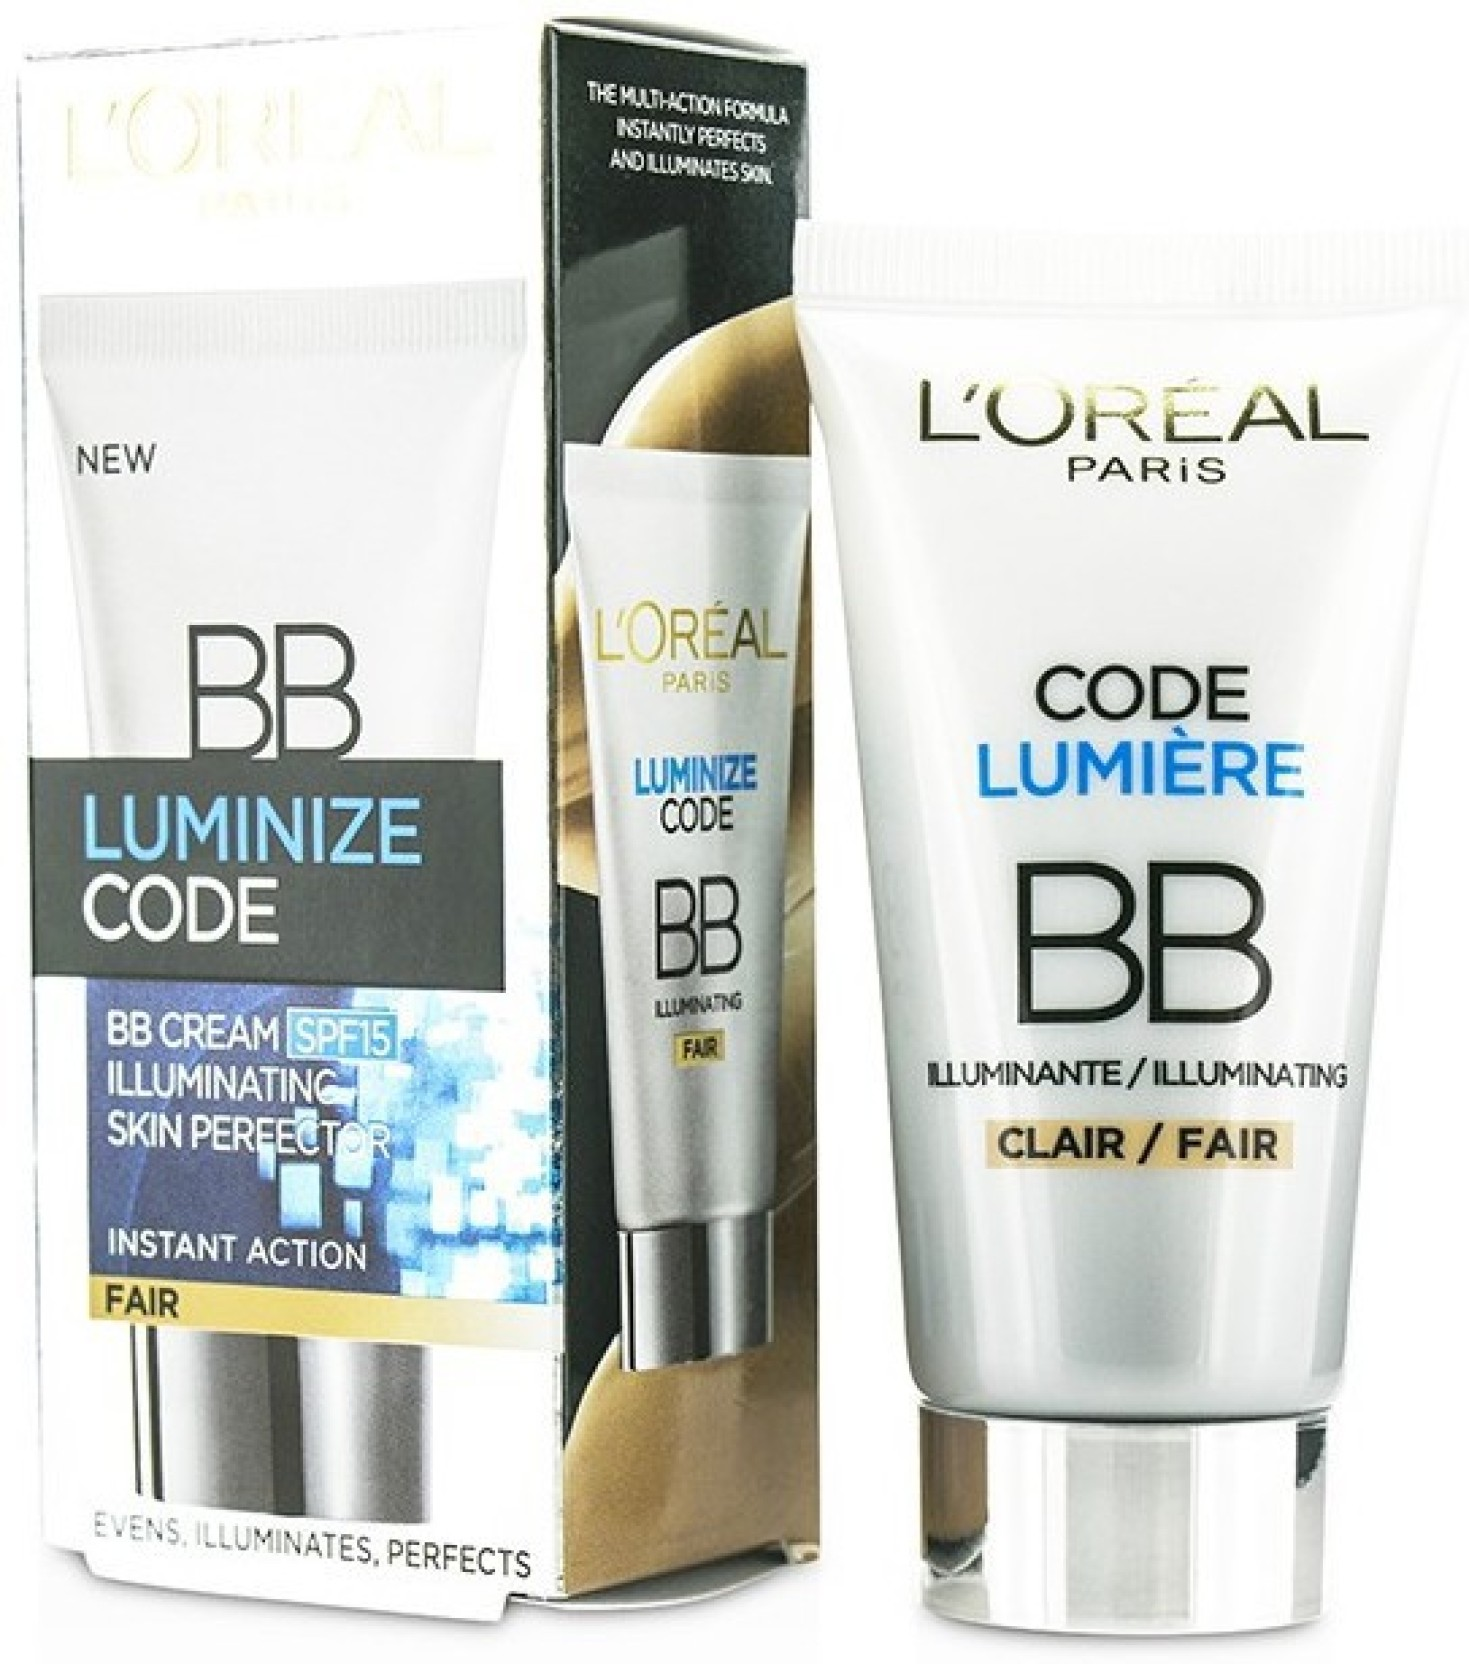 Loreal Paris Luminize Code Skin Perfector Bb Cream Spf15 Fair